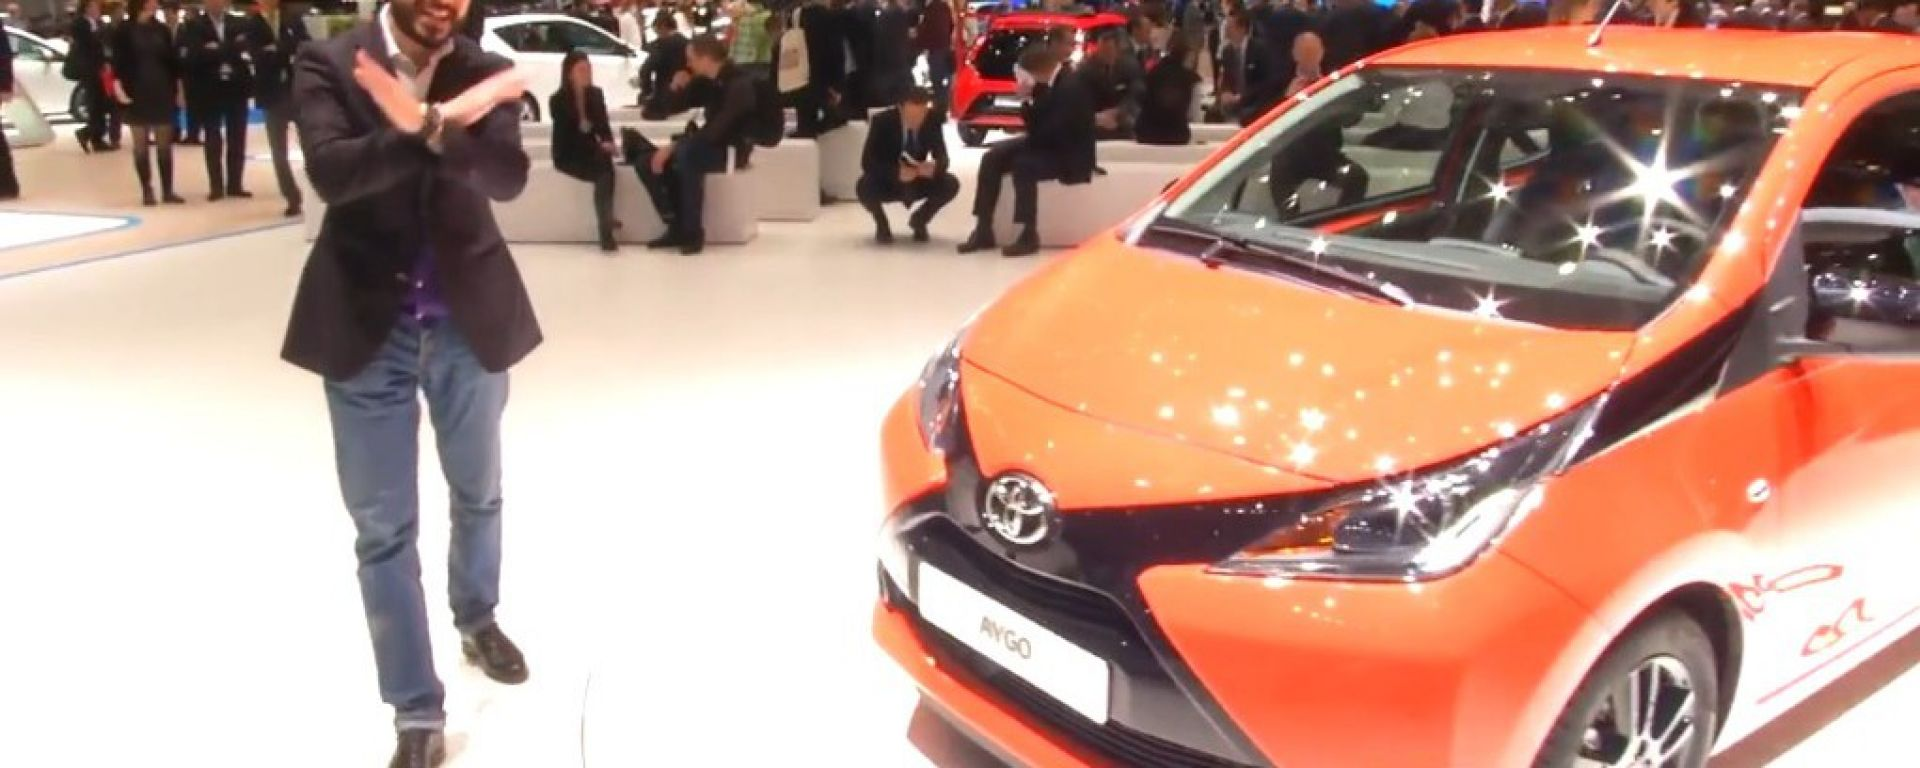 Salone di Ginevra 2014, lo stand Toyota